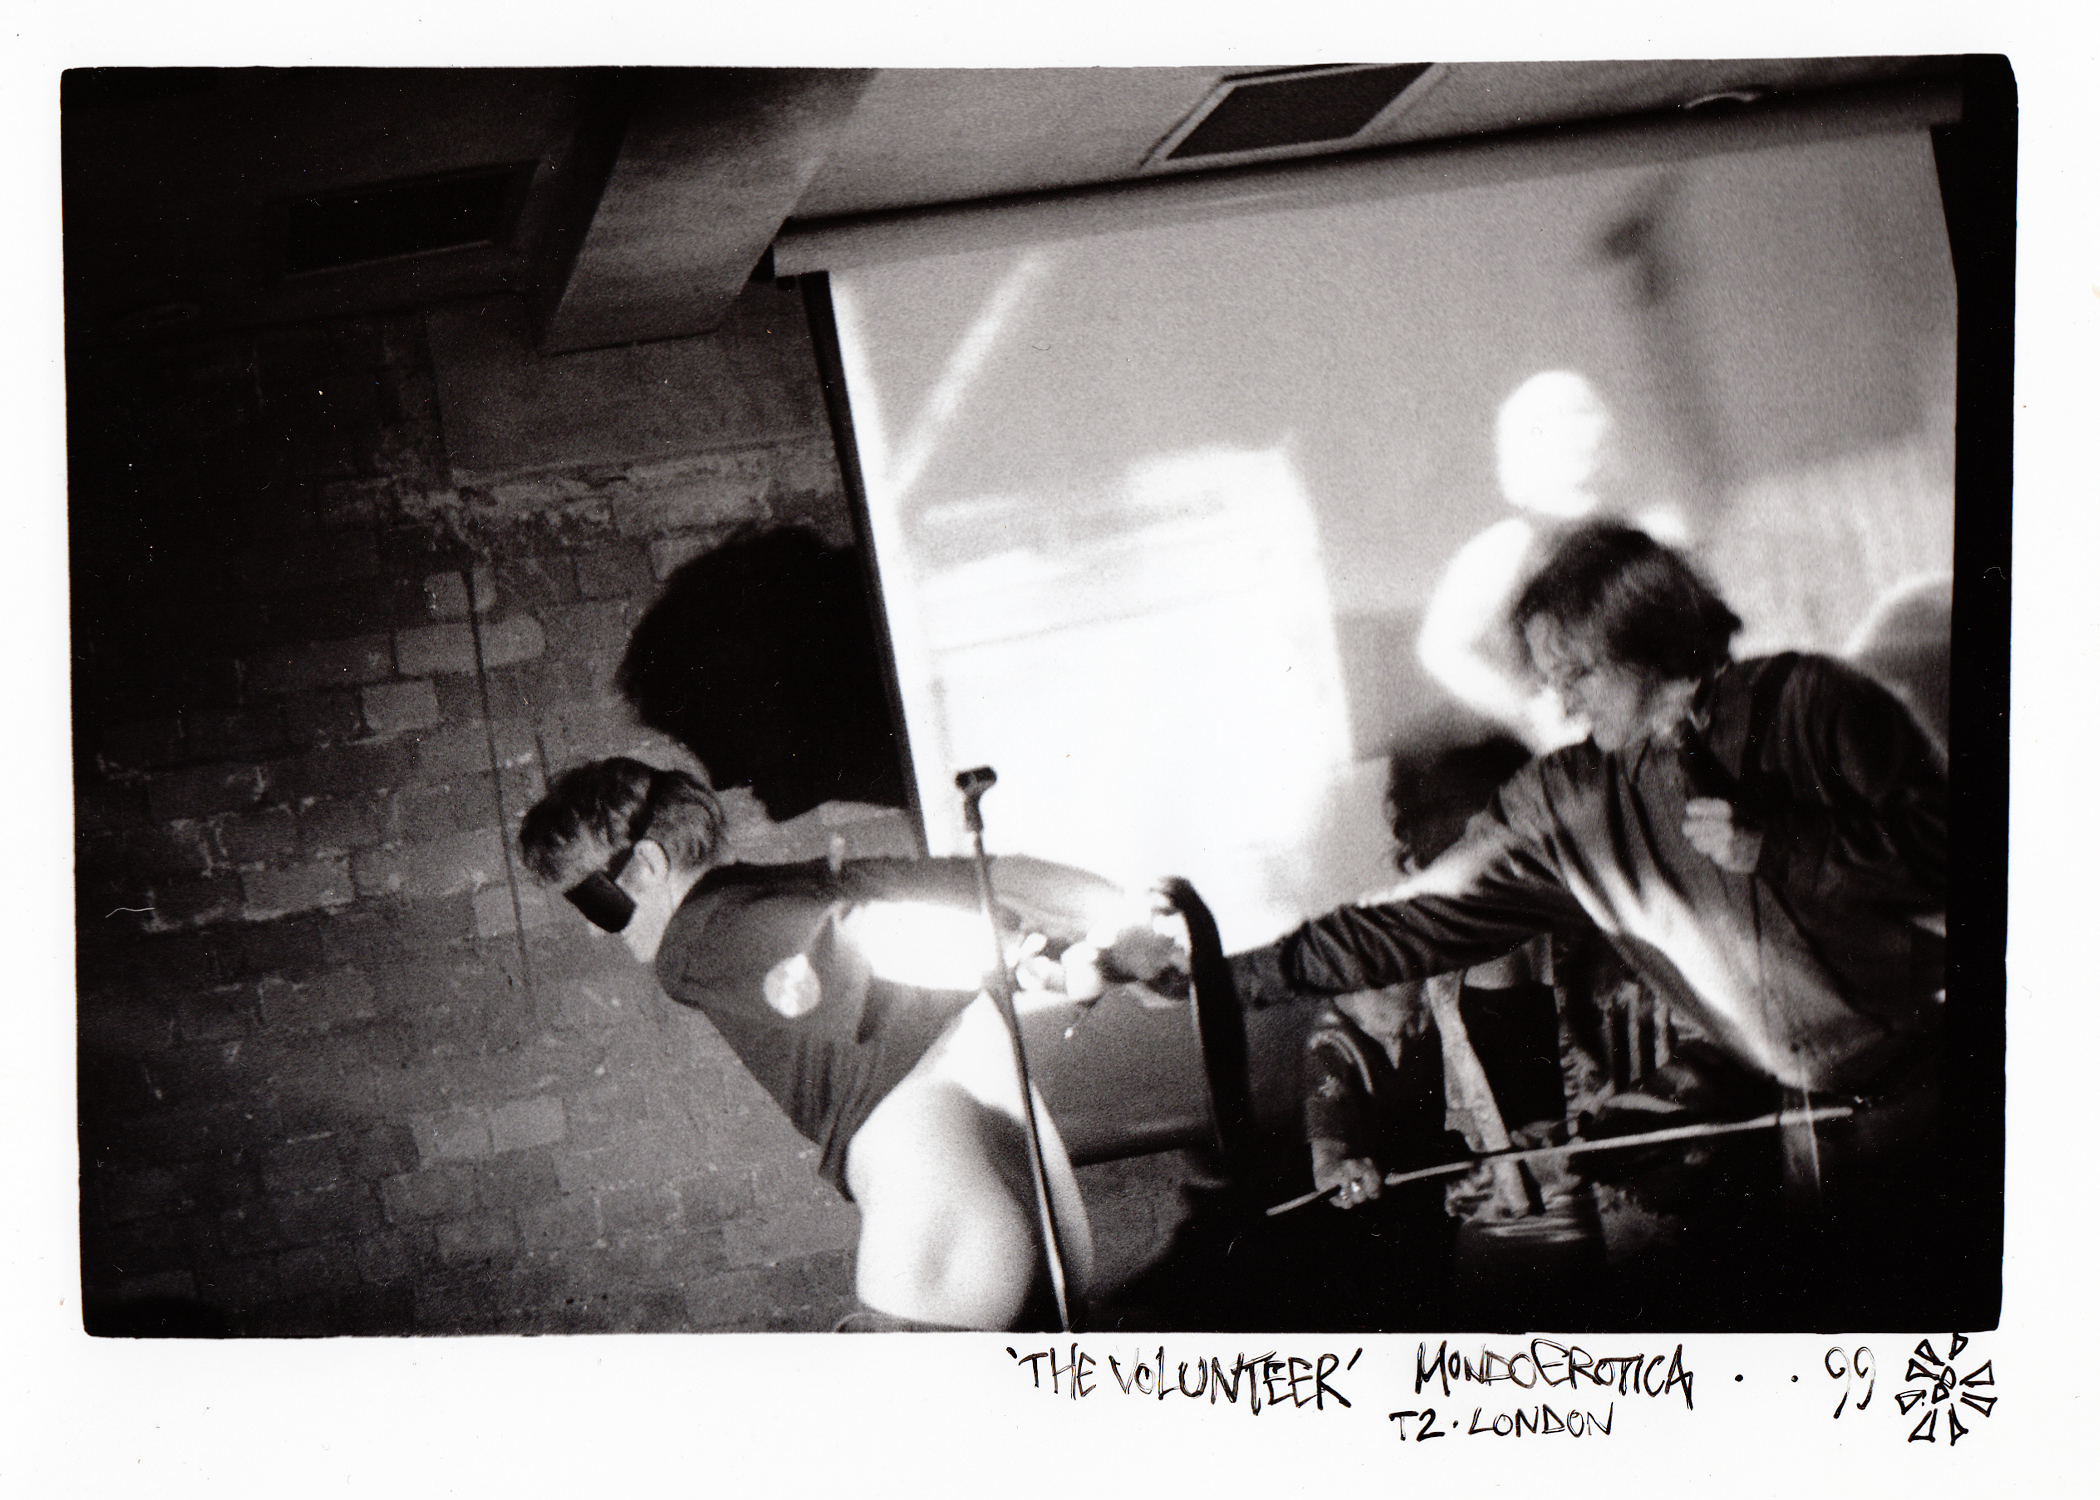 File:Audience participation at A & V Speakeasy presents Mondo Erotica  Turnmills, London 1999.jpg